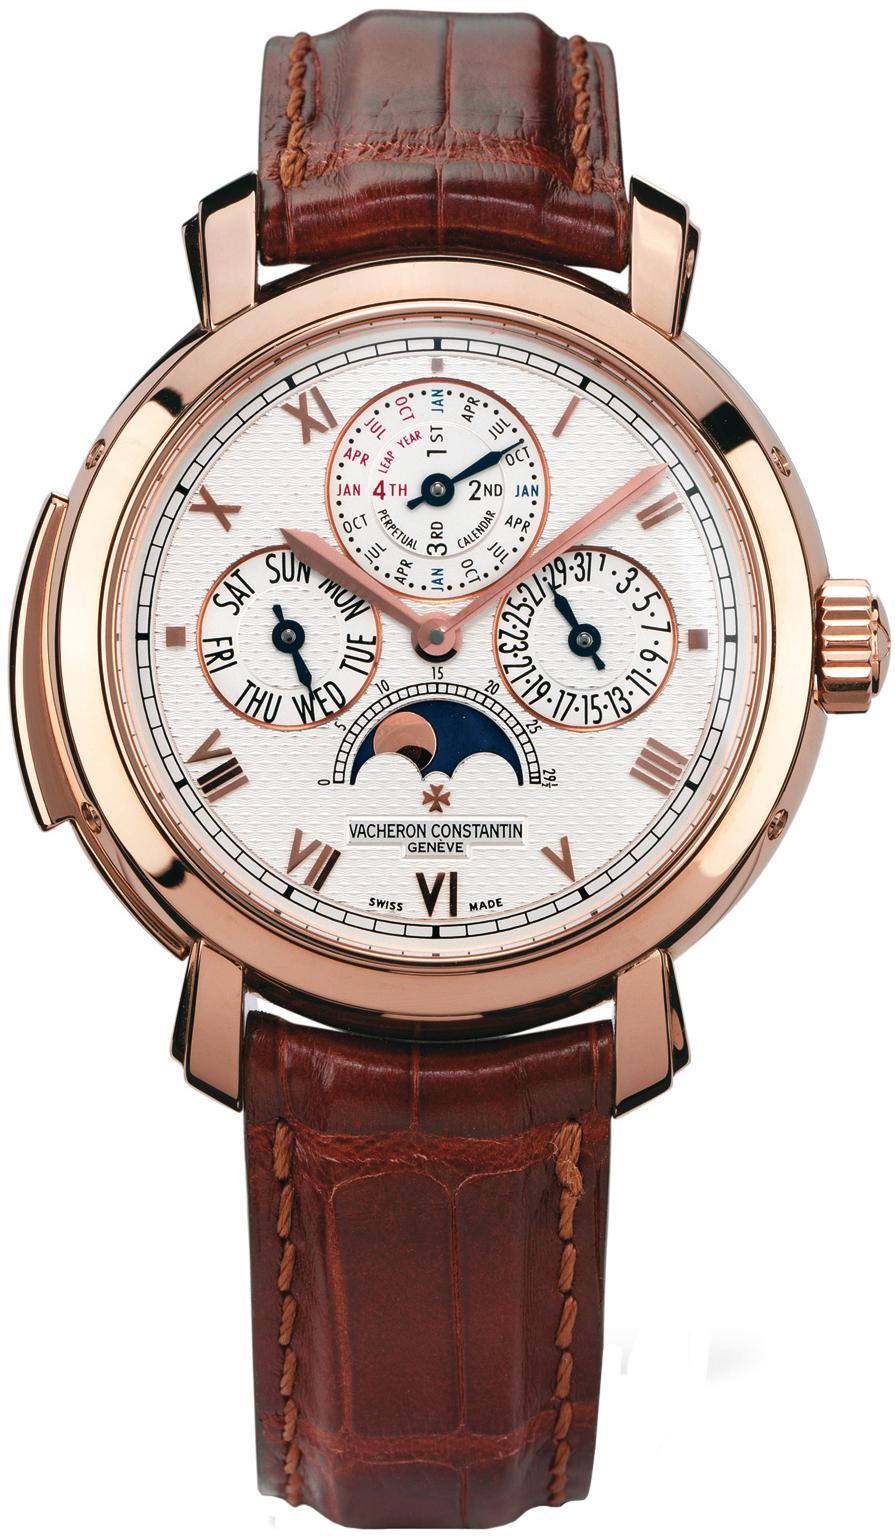 Vacheron Constantin 30040/000r-9090 LIMITED Malte Minute Repeater Perpetual Calendar Mens Watches